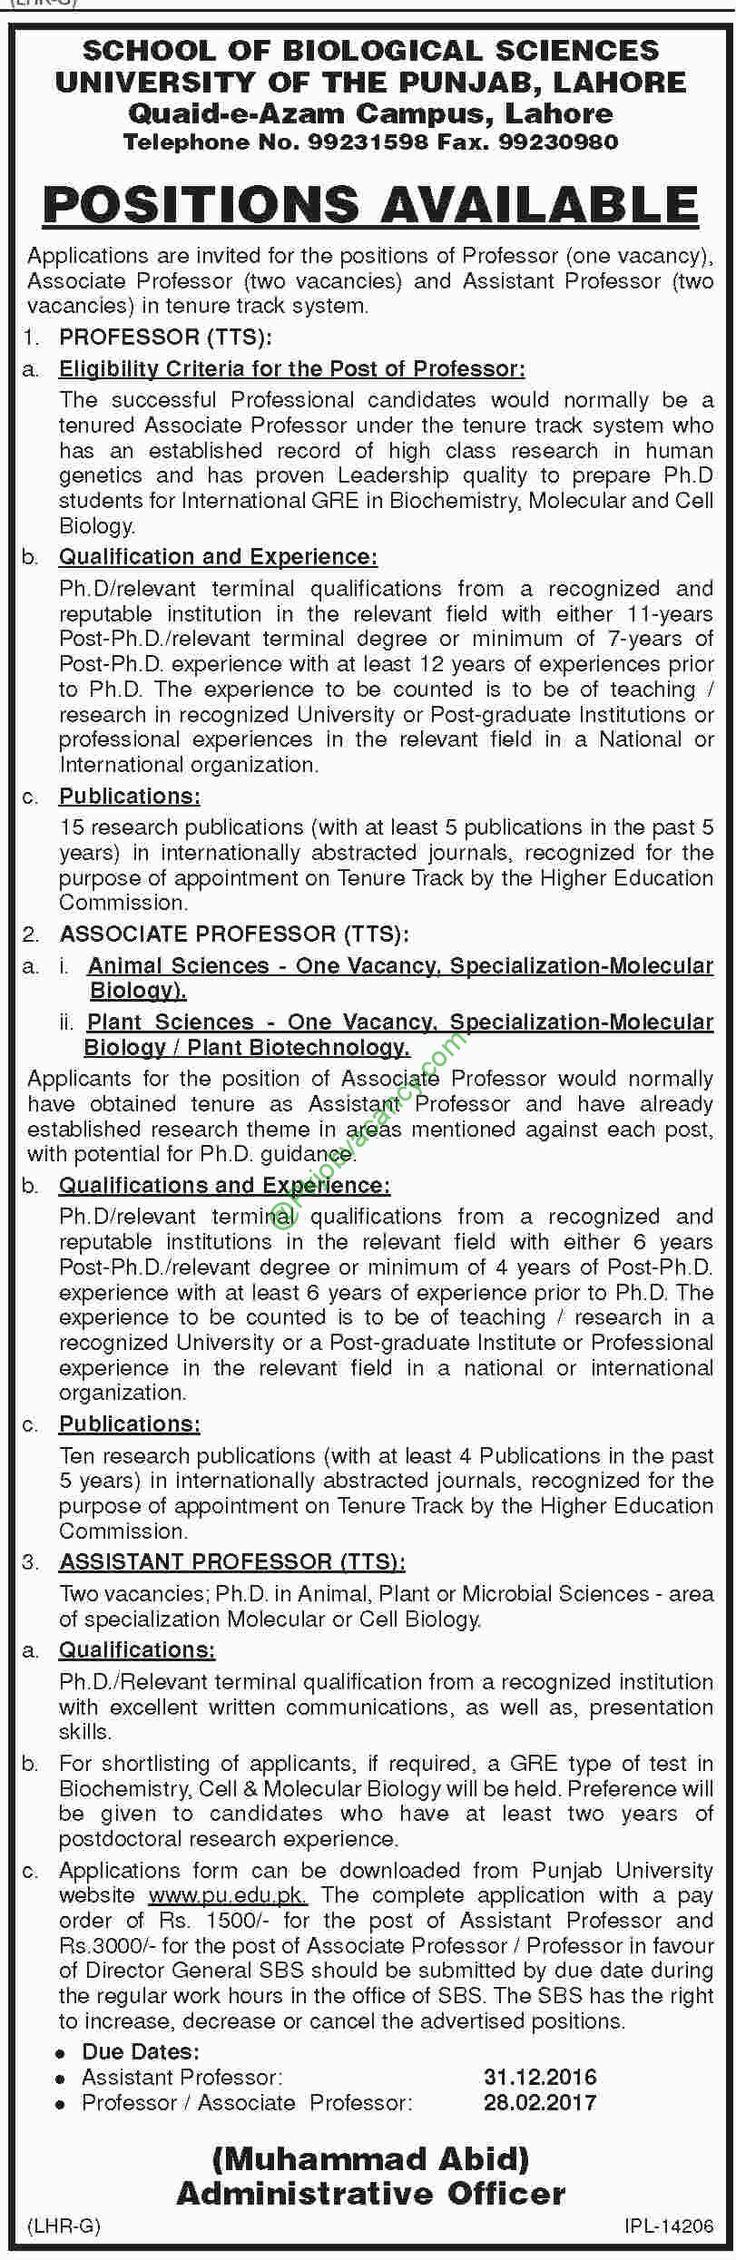 School Of Biological Sciences University Of The Punjab Jobs Dawn Newspaper